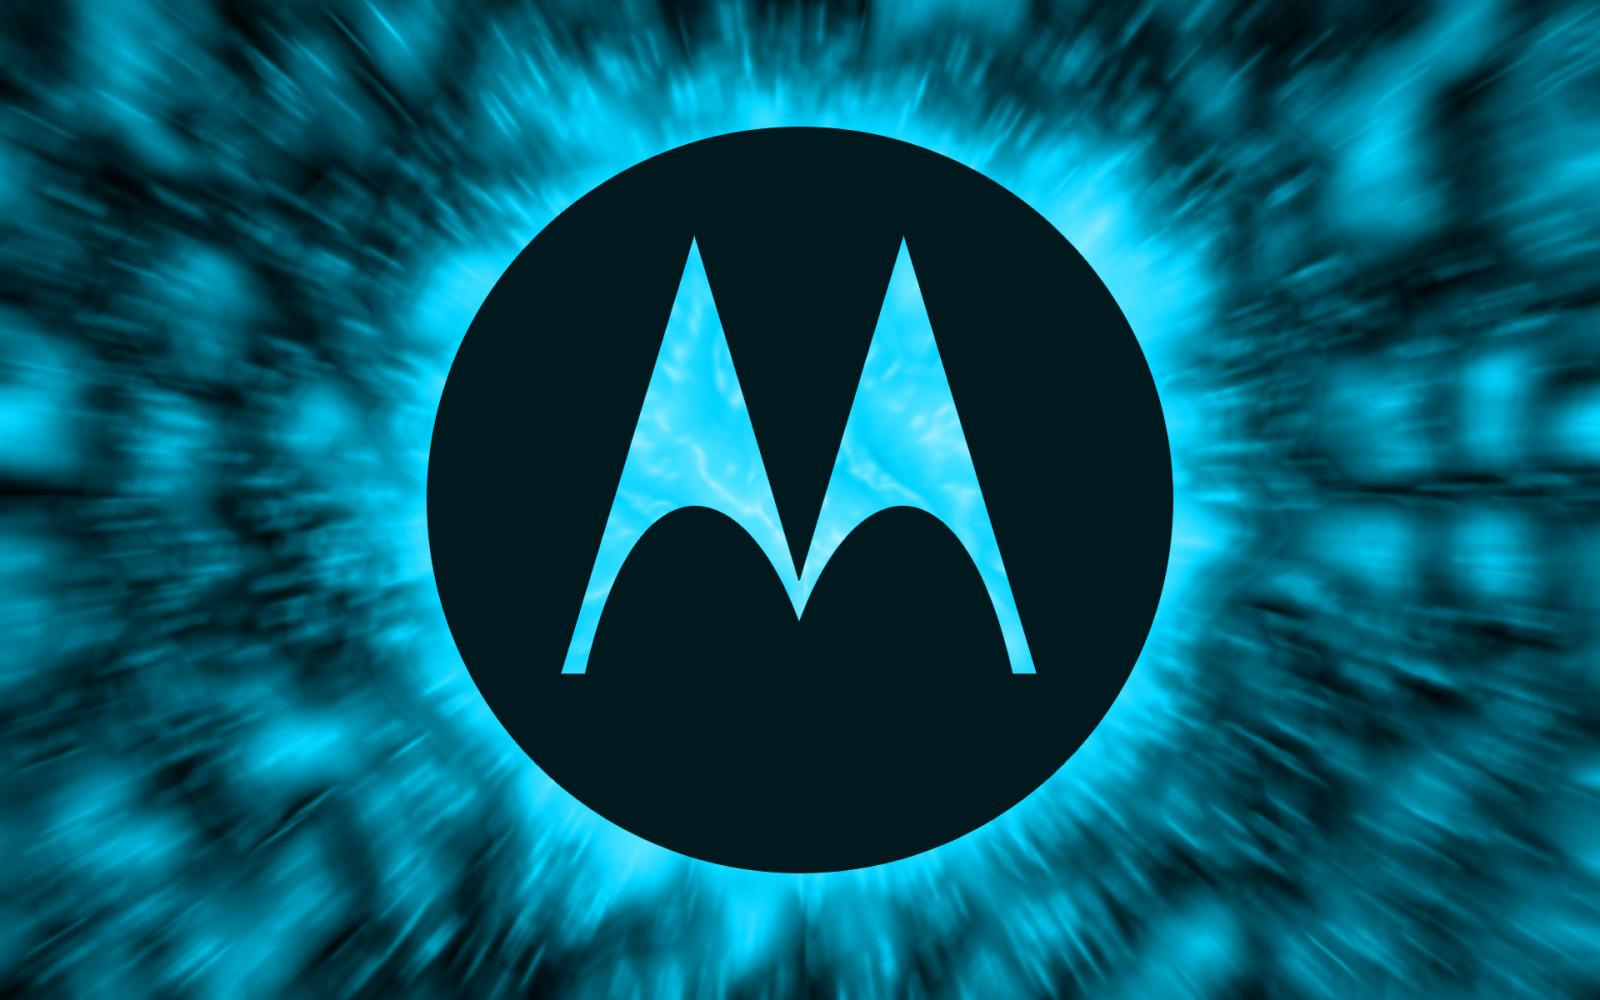 Motorola Moto E Wallpaper